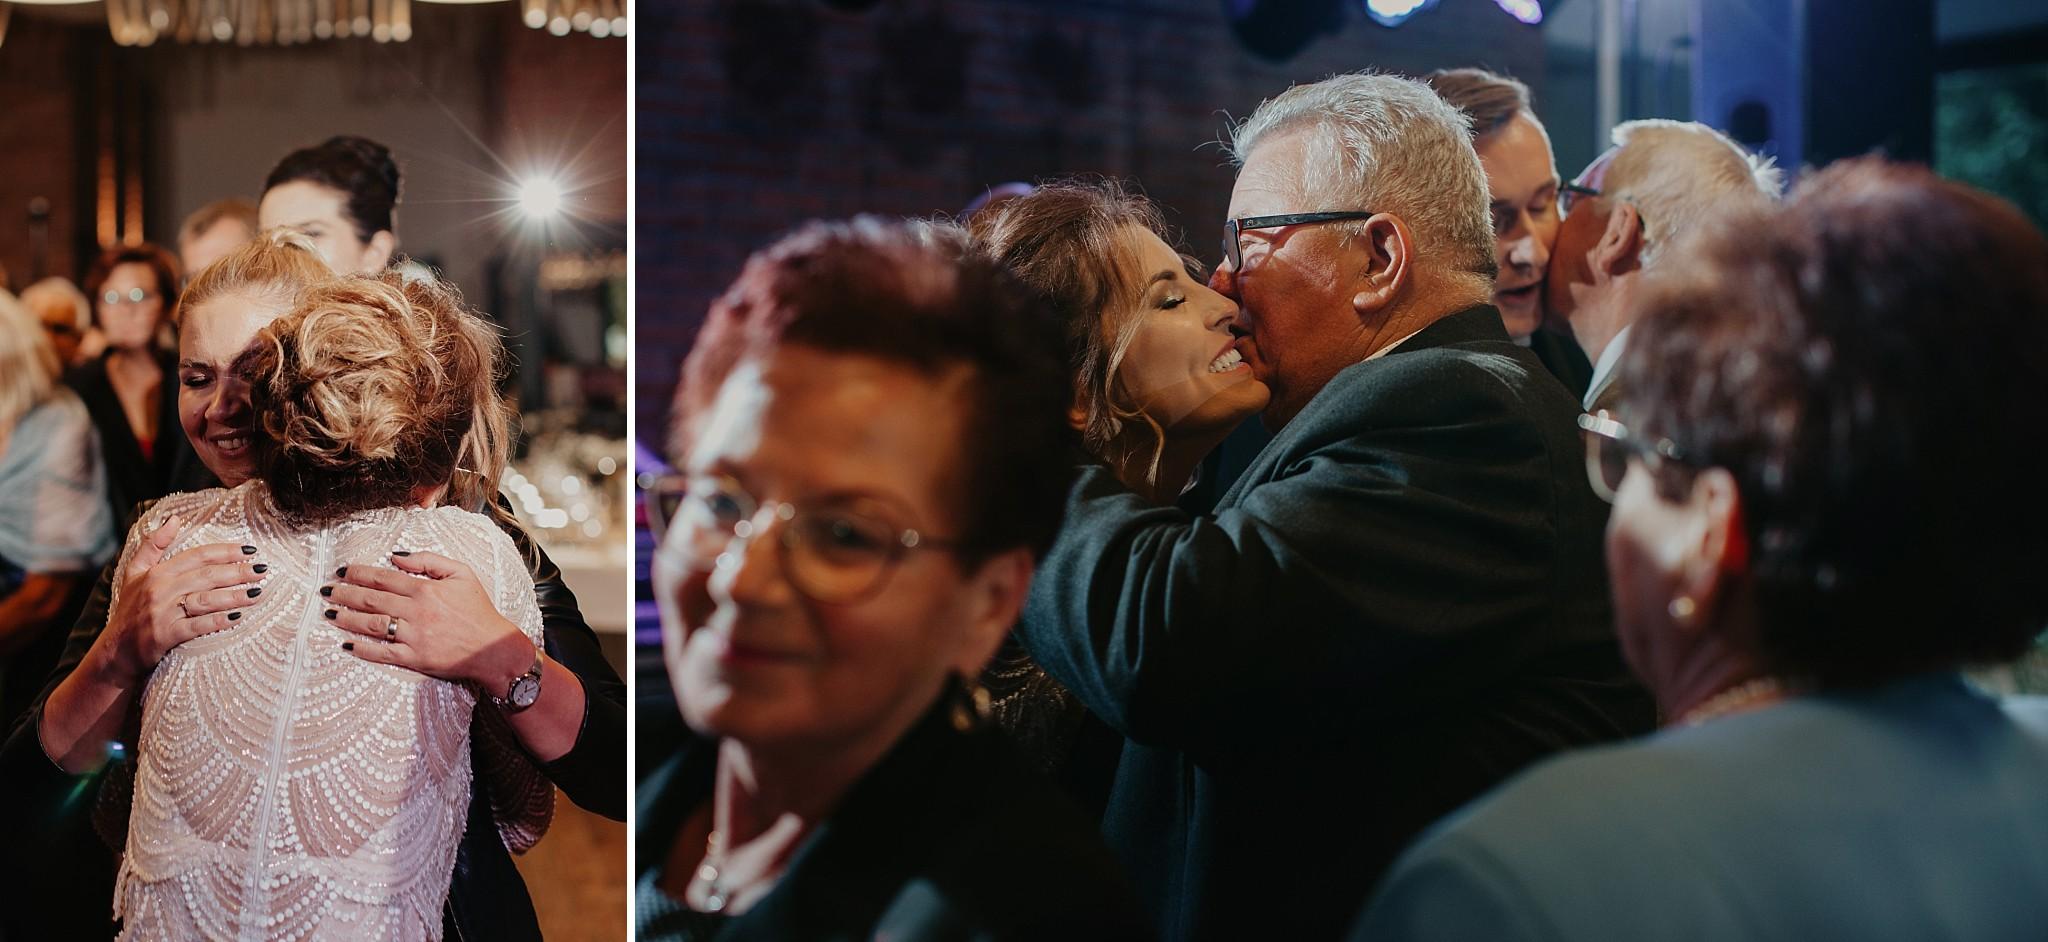 fotograf poznan wesele dobra truskawka piekne wesele pod poznaniem wesele w dobrej truskawce piekna para mloda slub marzen slub koronawirus slub listopad wesele koronawirus 276